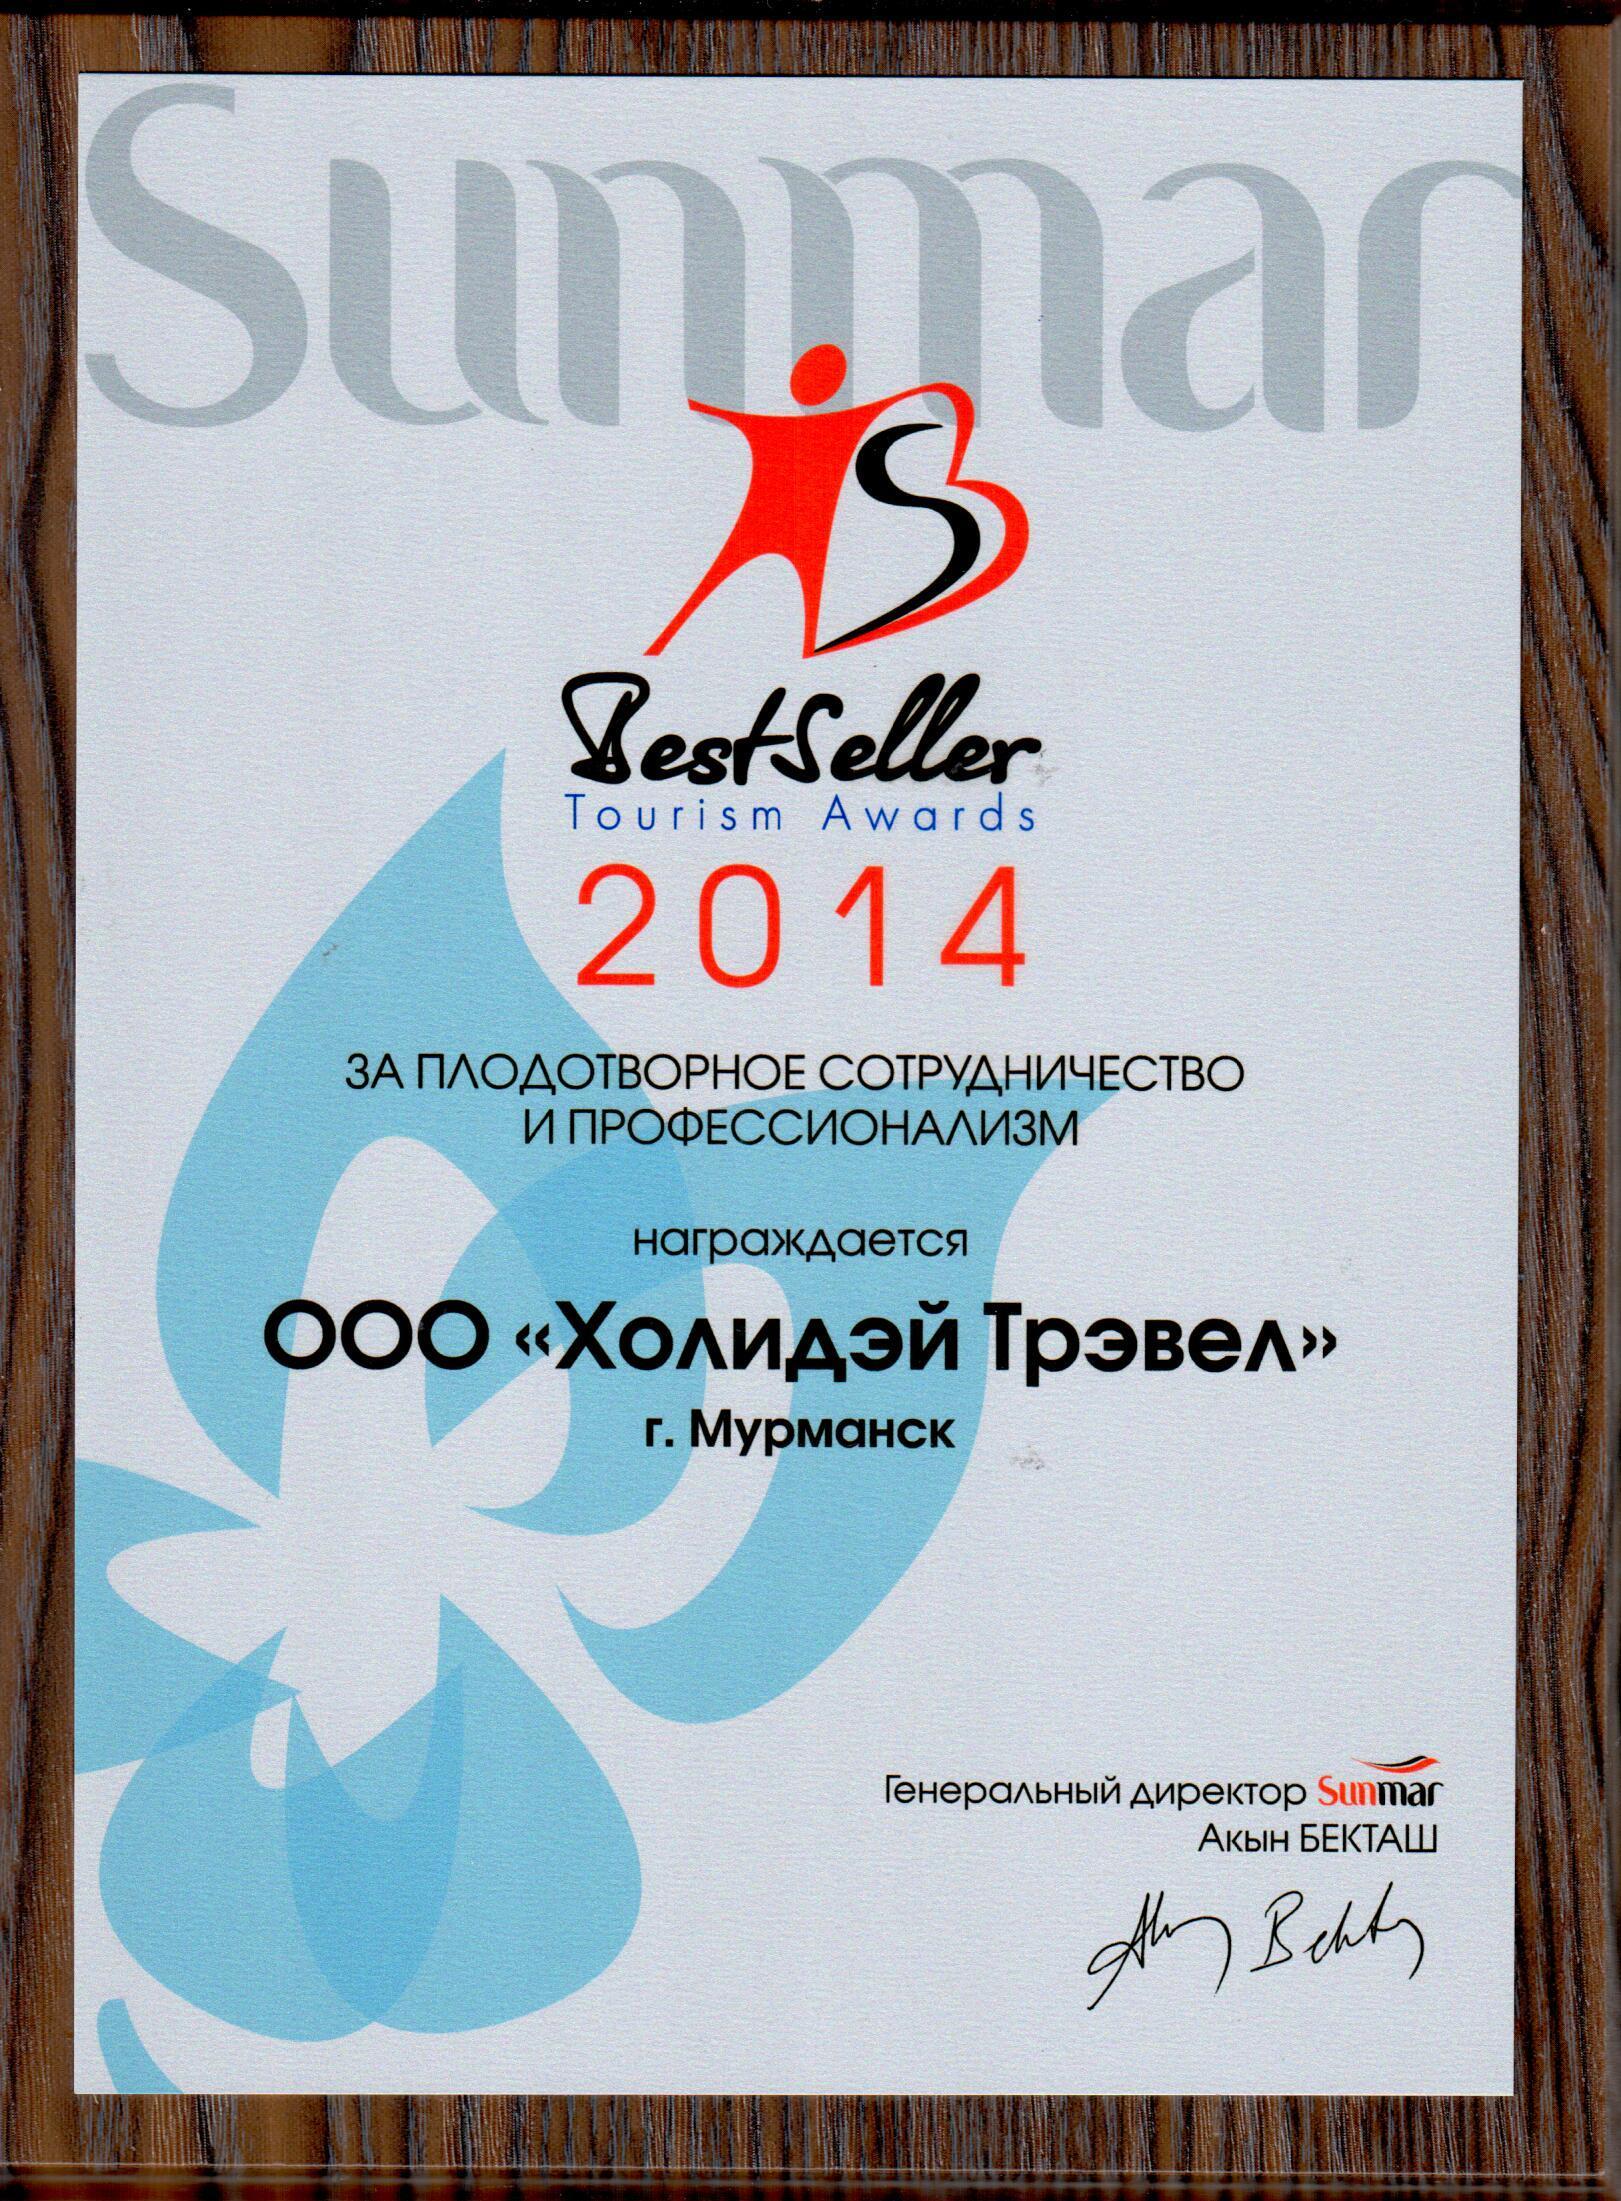 Санмар 2014